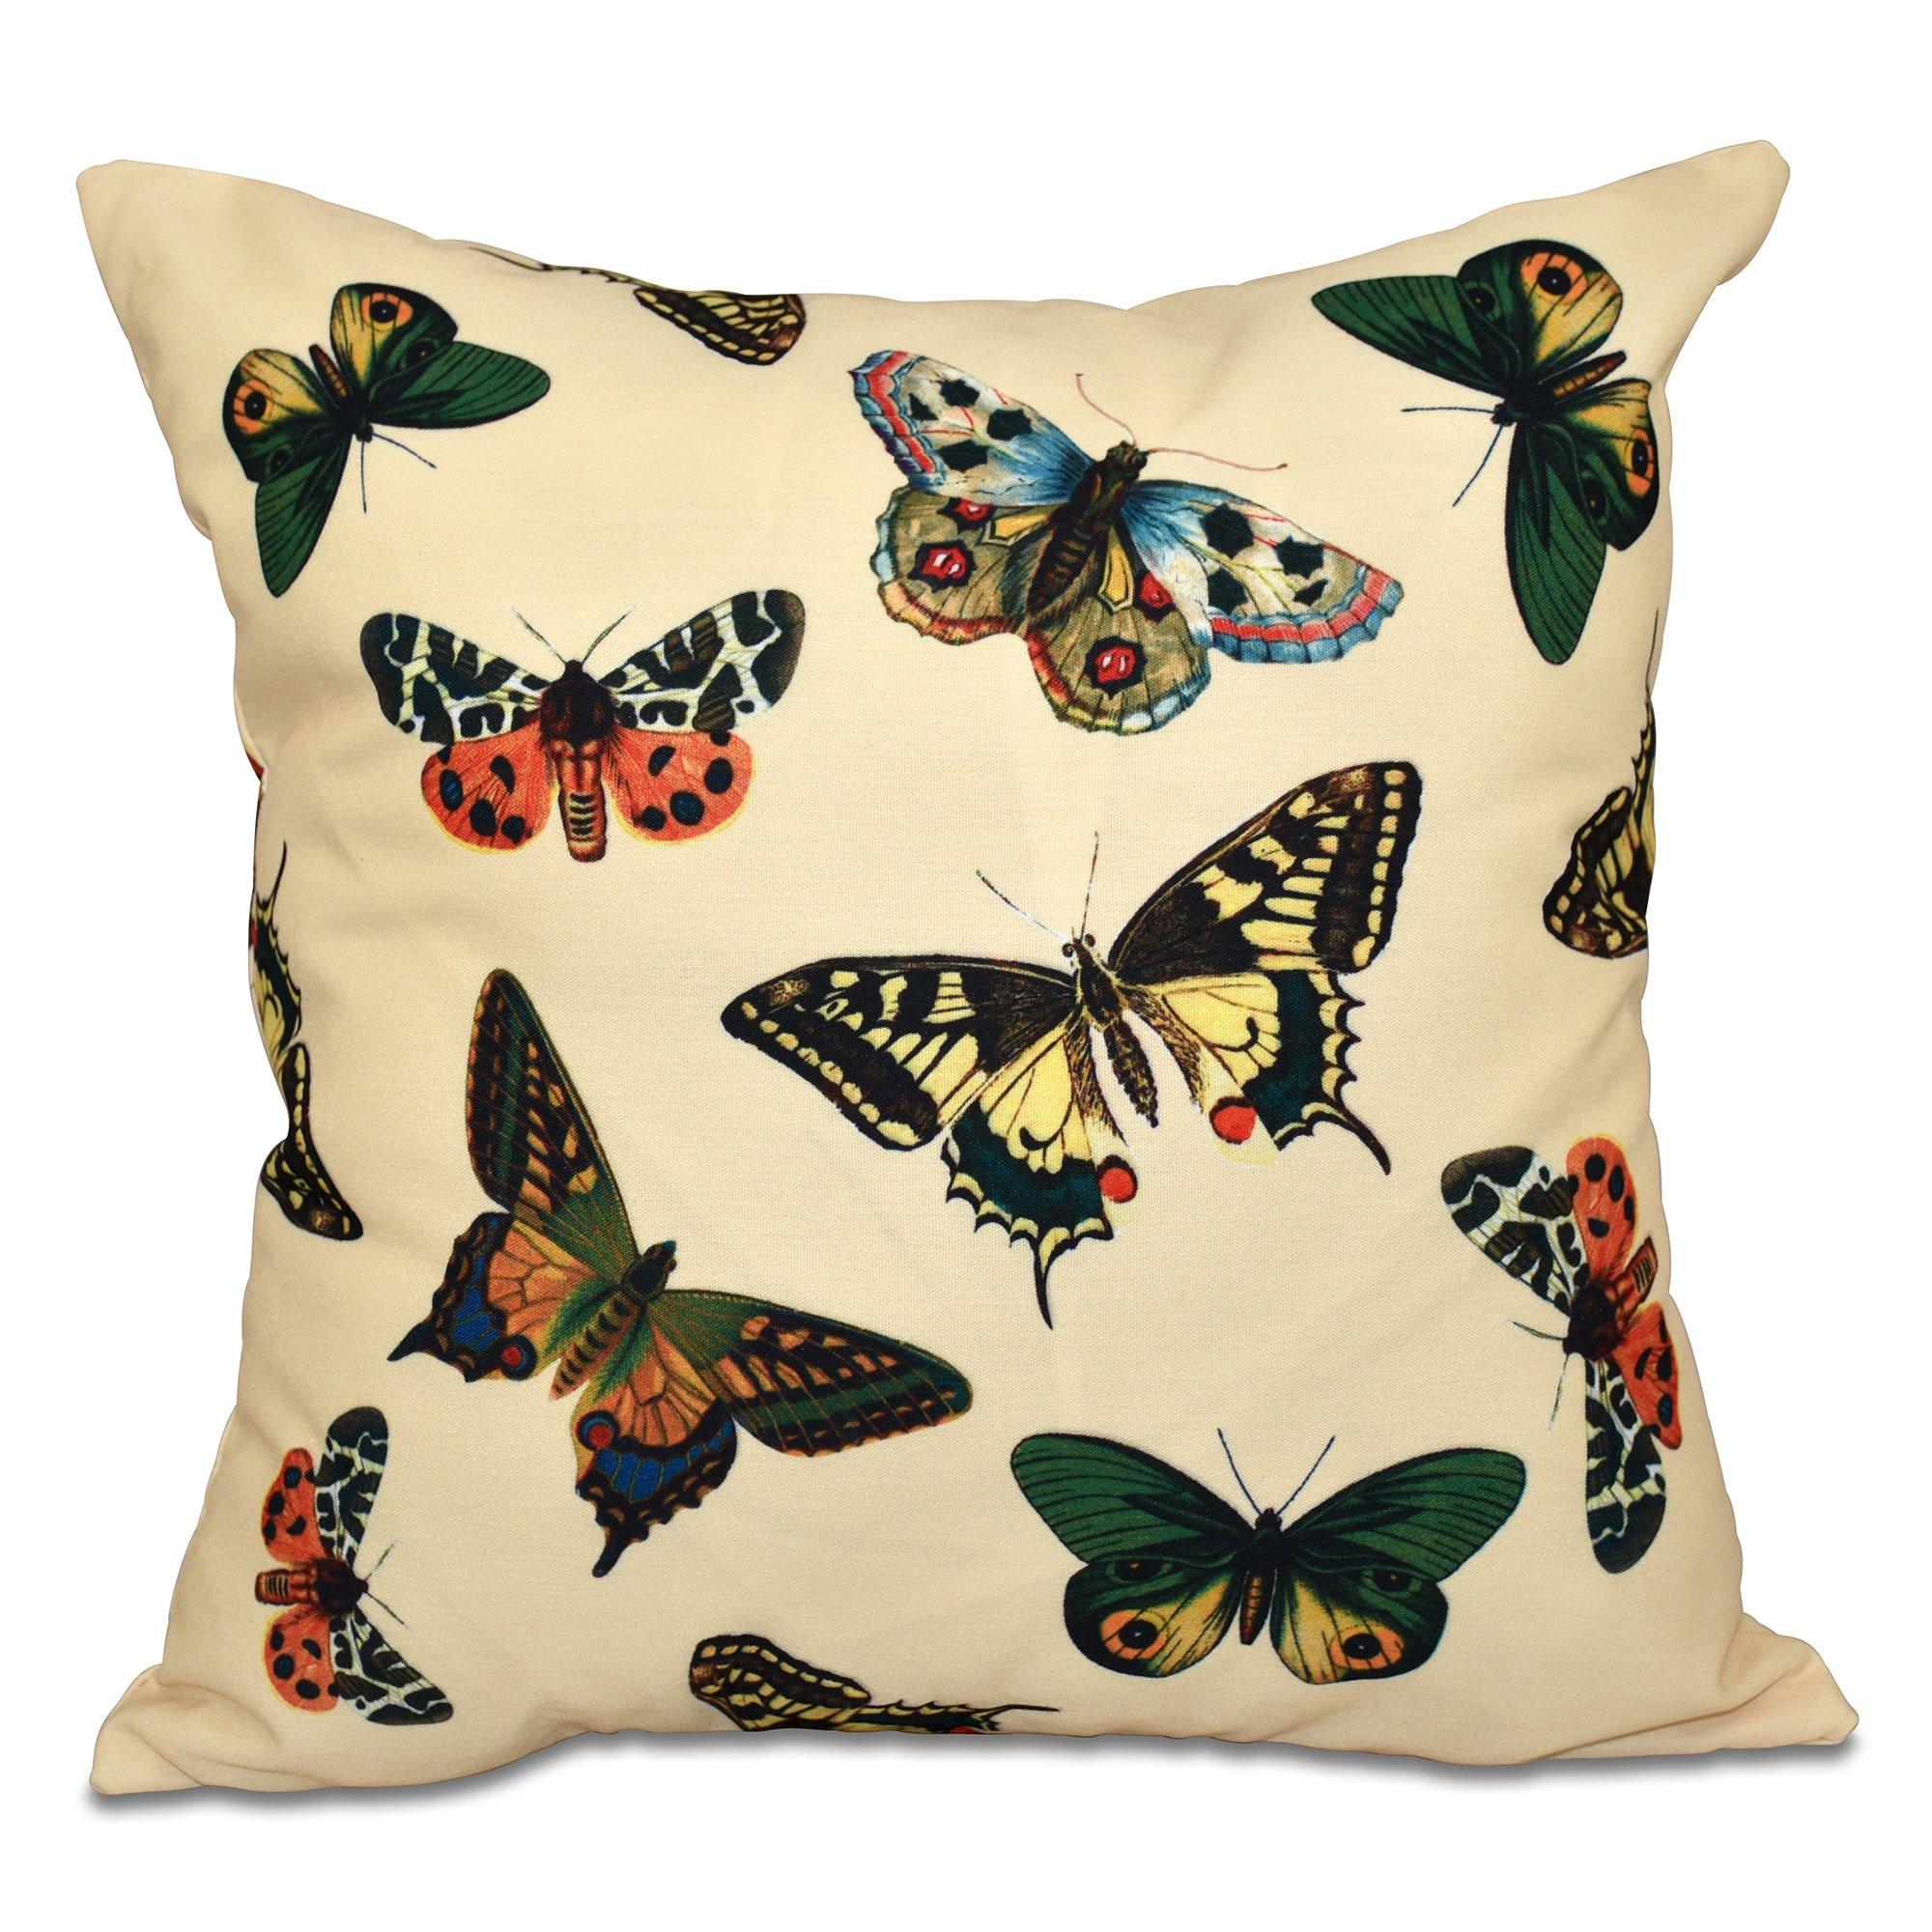 E by design O5PAN491YE2-20 20 x 20 Butterflies Animal Print Yellow Outdoor Pillow